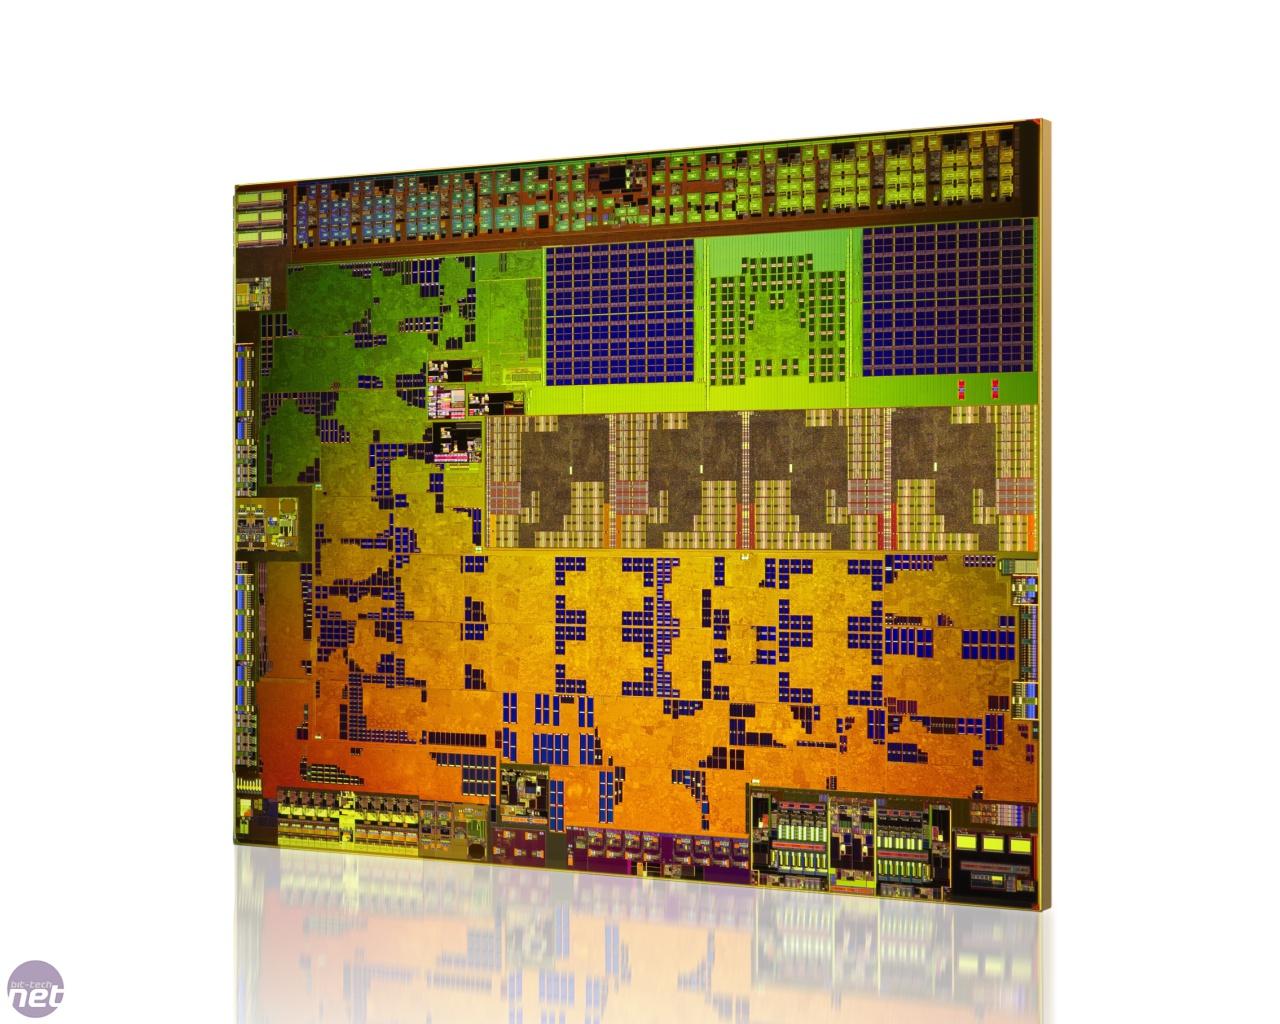 Amd Athlon 5350 Kabini Review Bit Tech Net